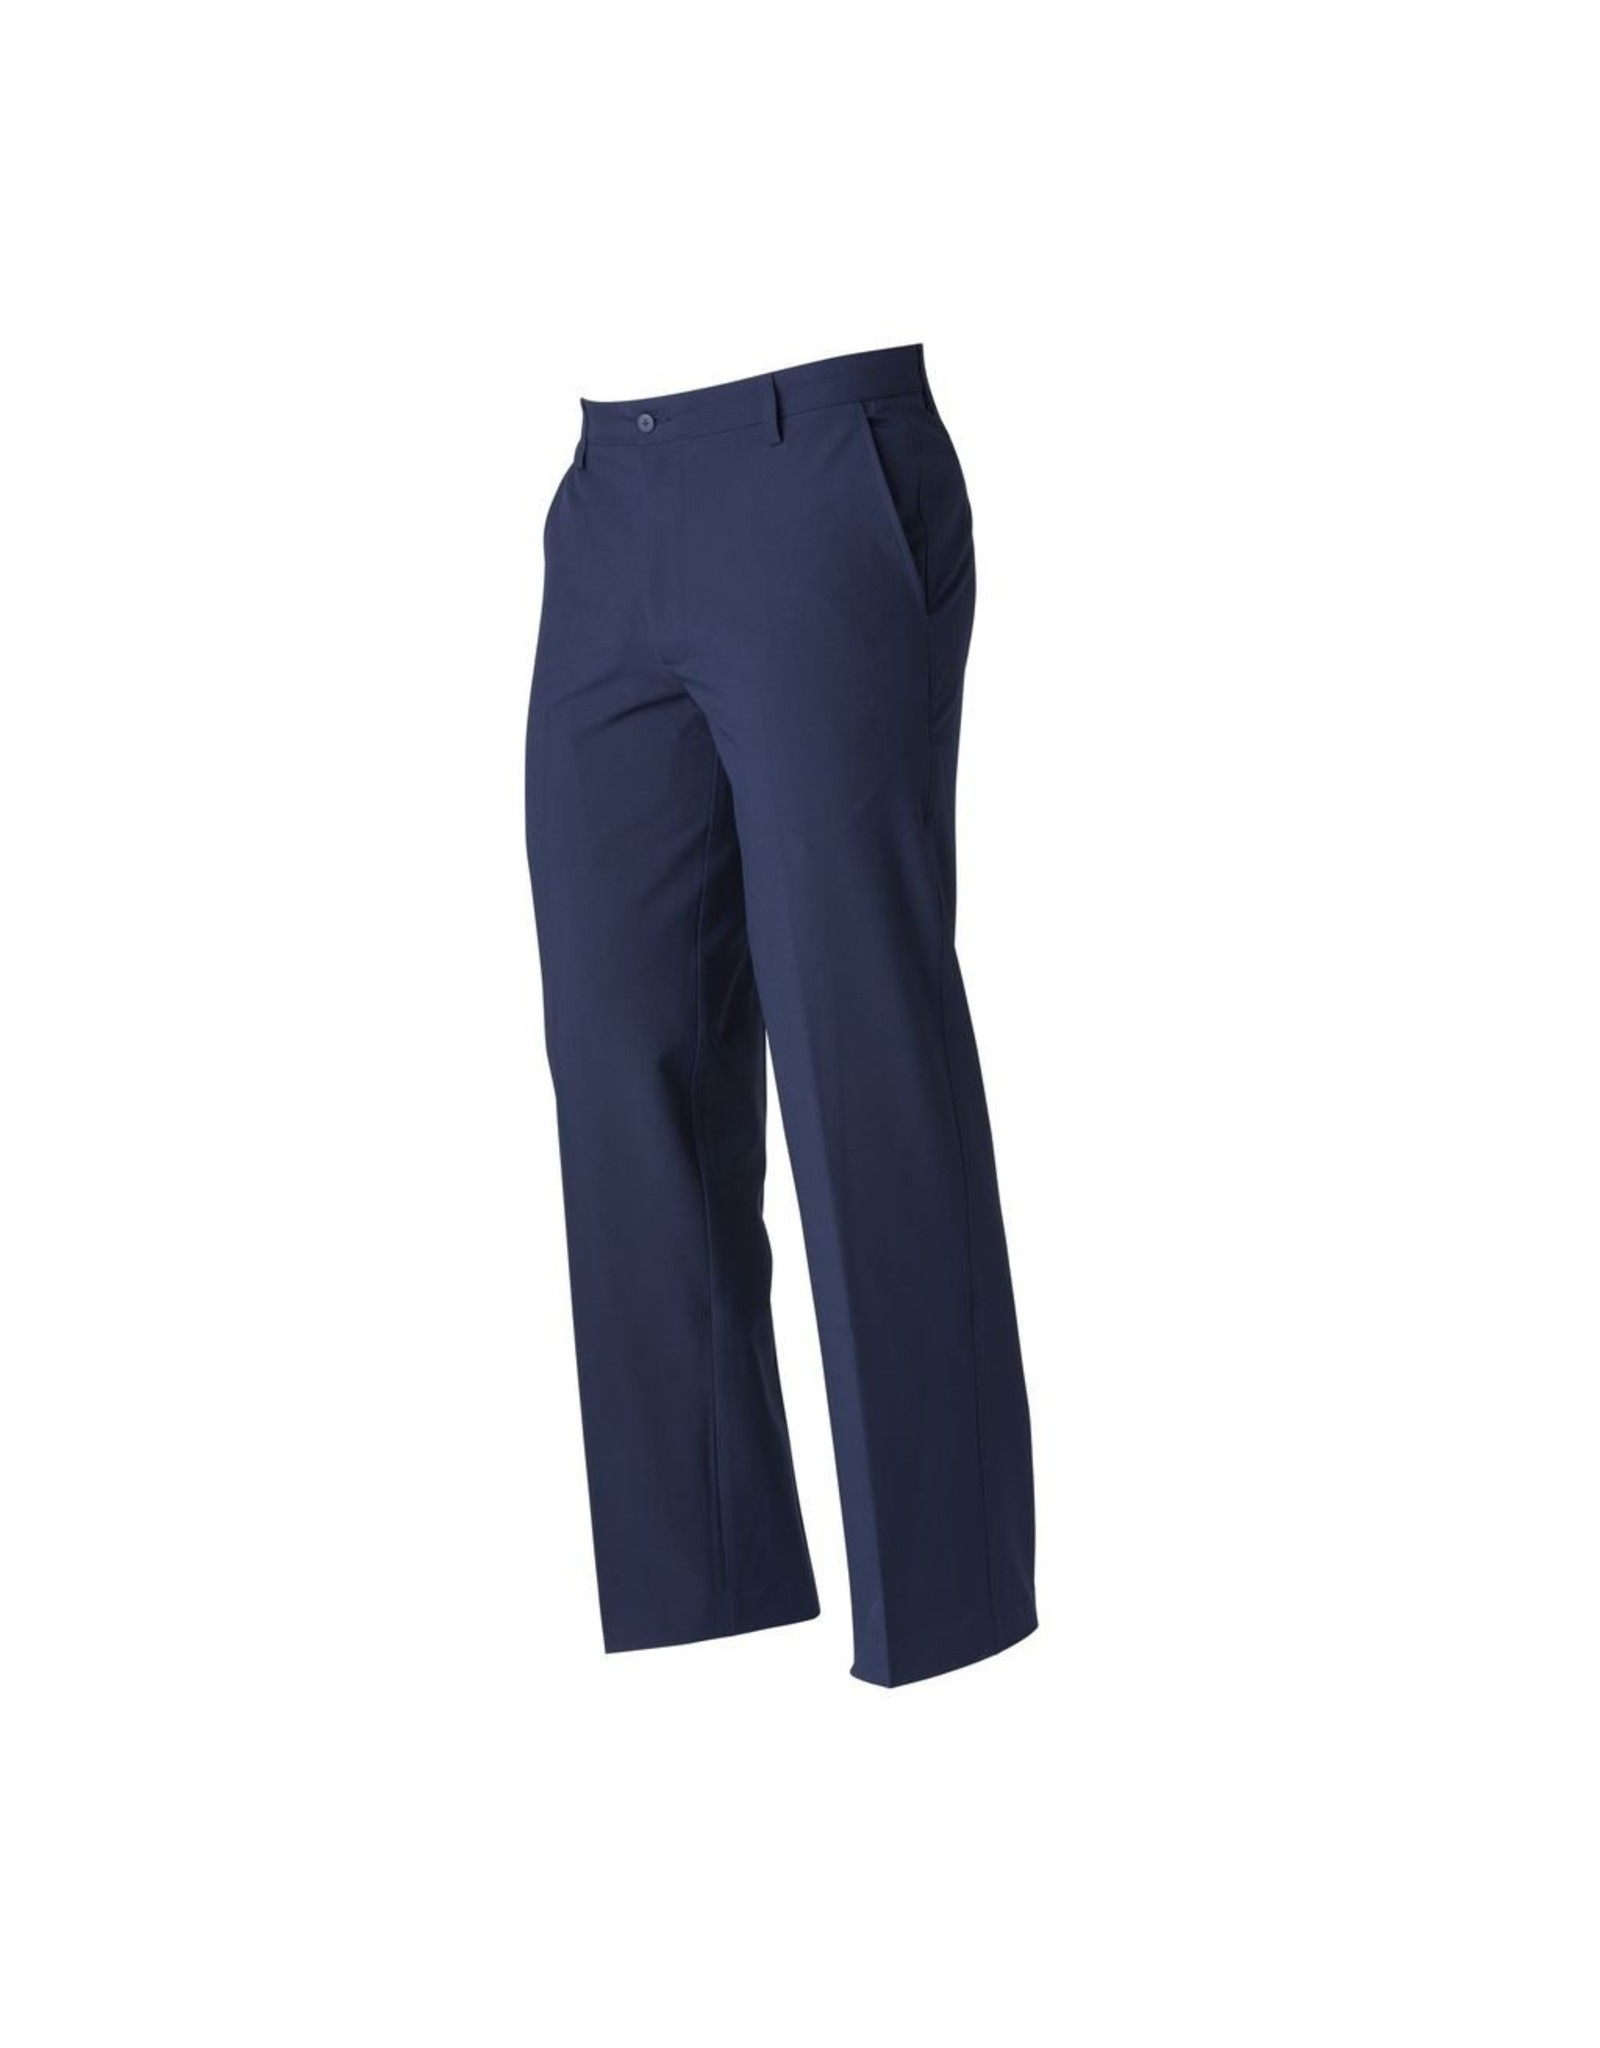 Footjoy FJ Men's Performance Slim Fit Golf Pants